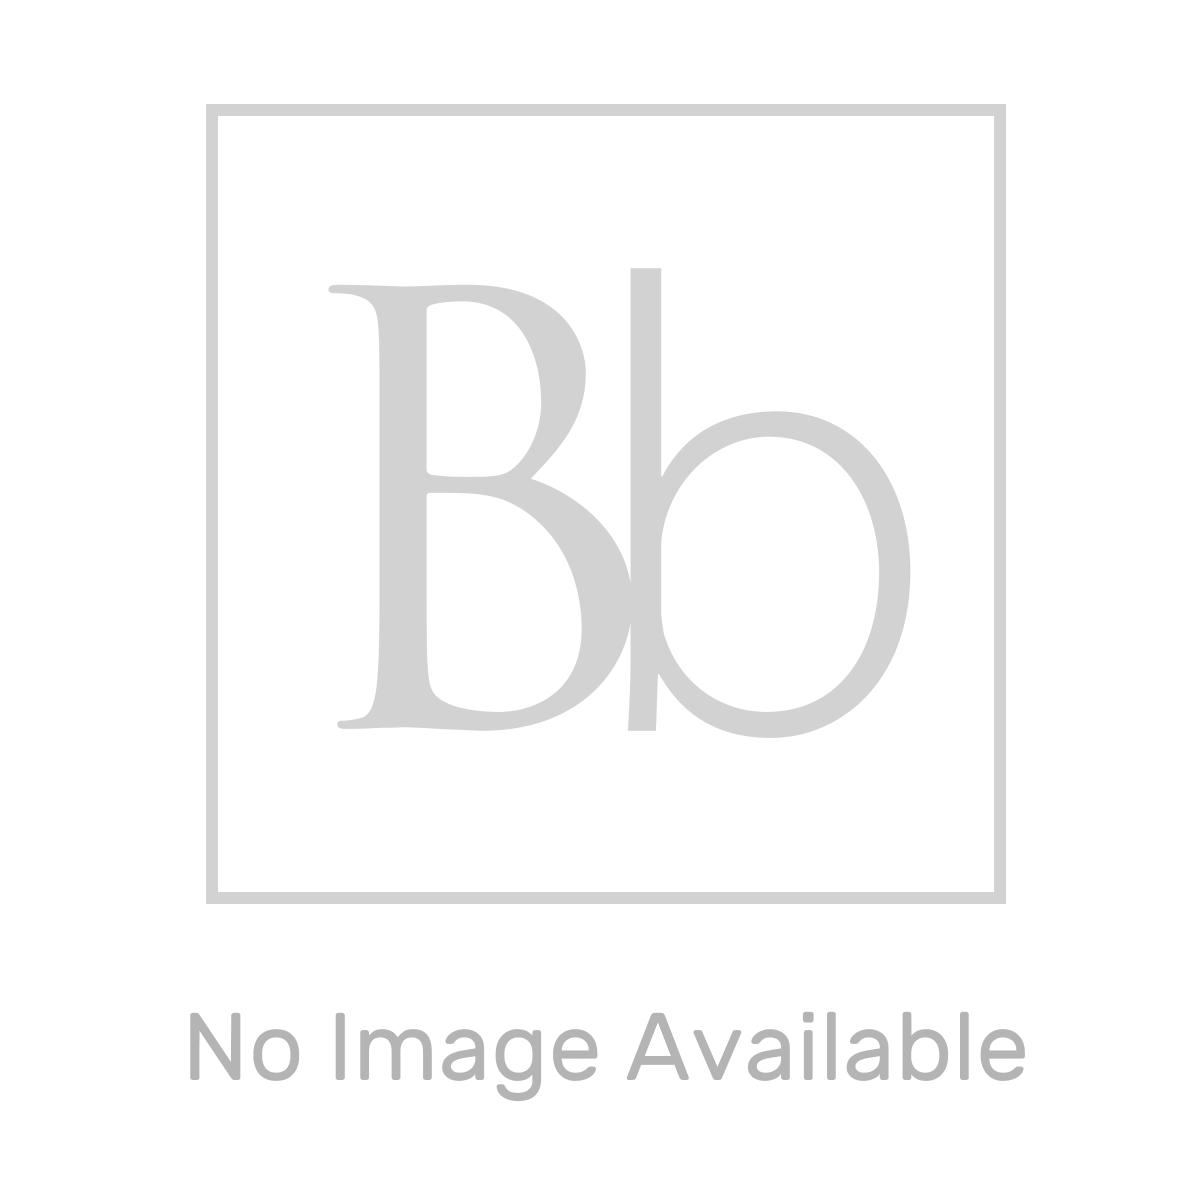 Ultra Vibe Bath Shower Mixer Tap